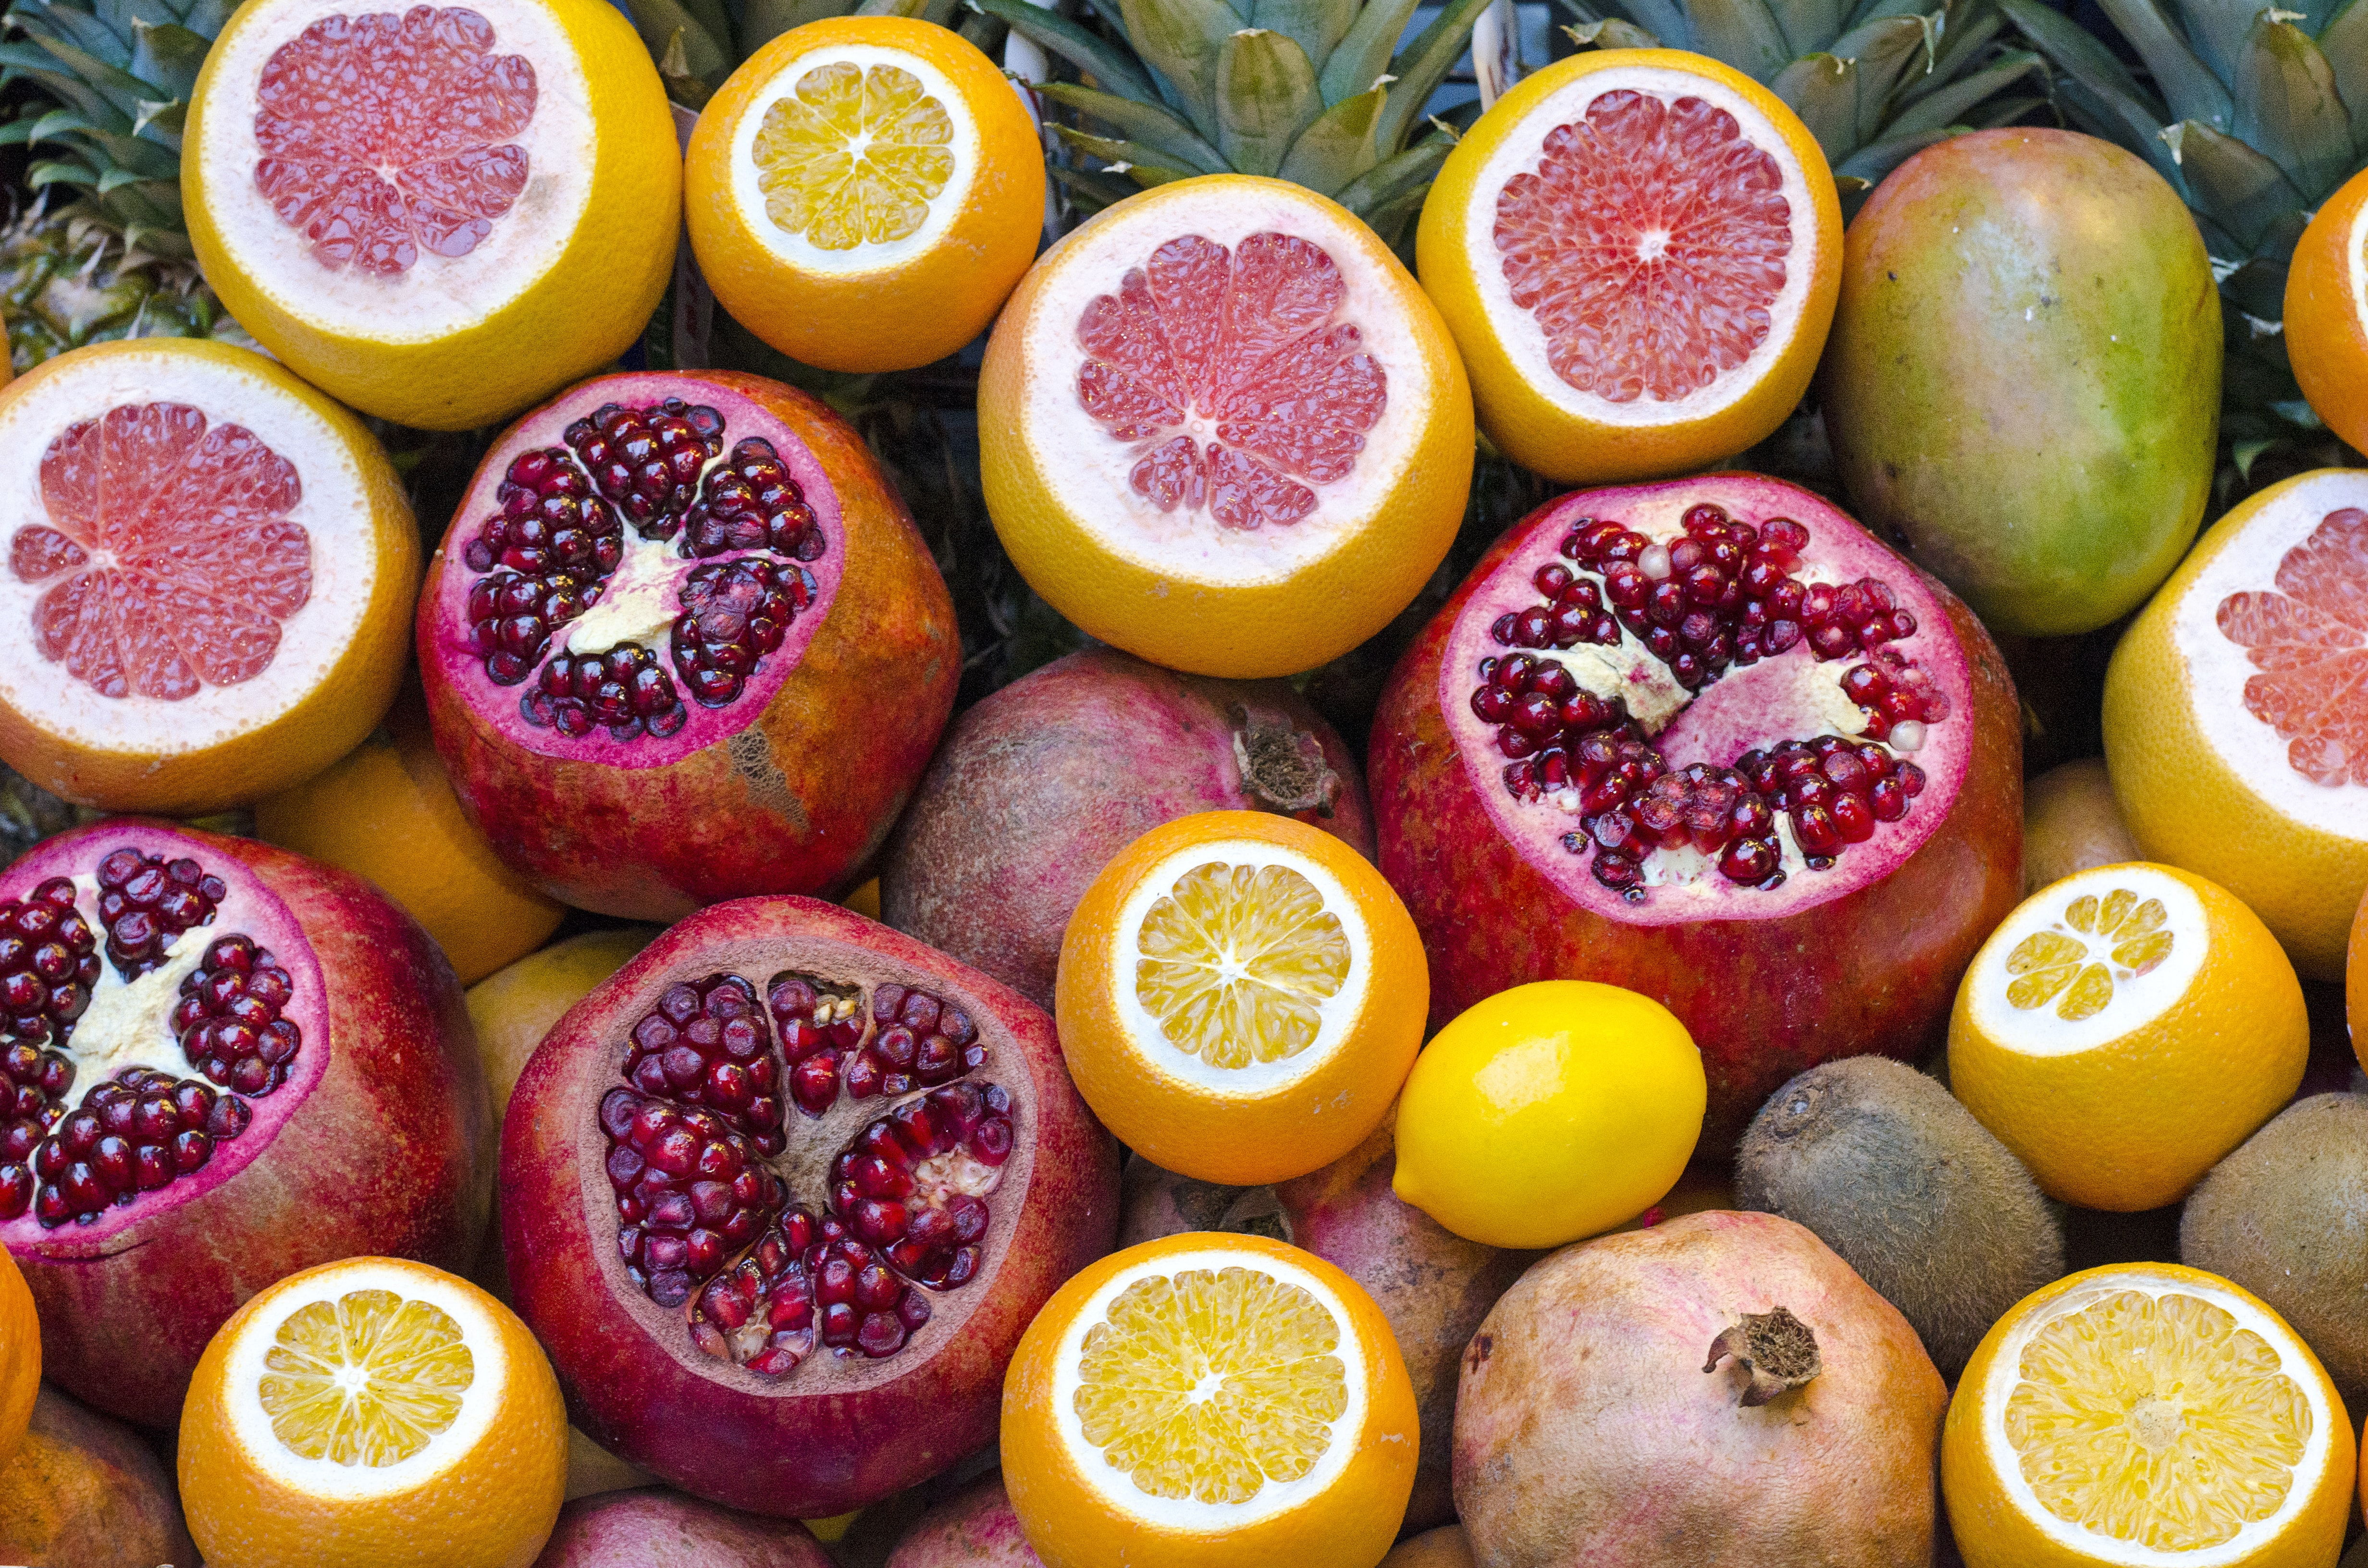 Mango, grapefruit, pomegranate, and tropical fruit sliced open